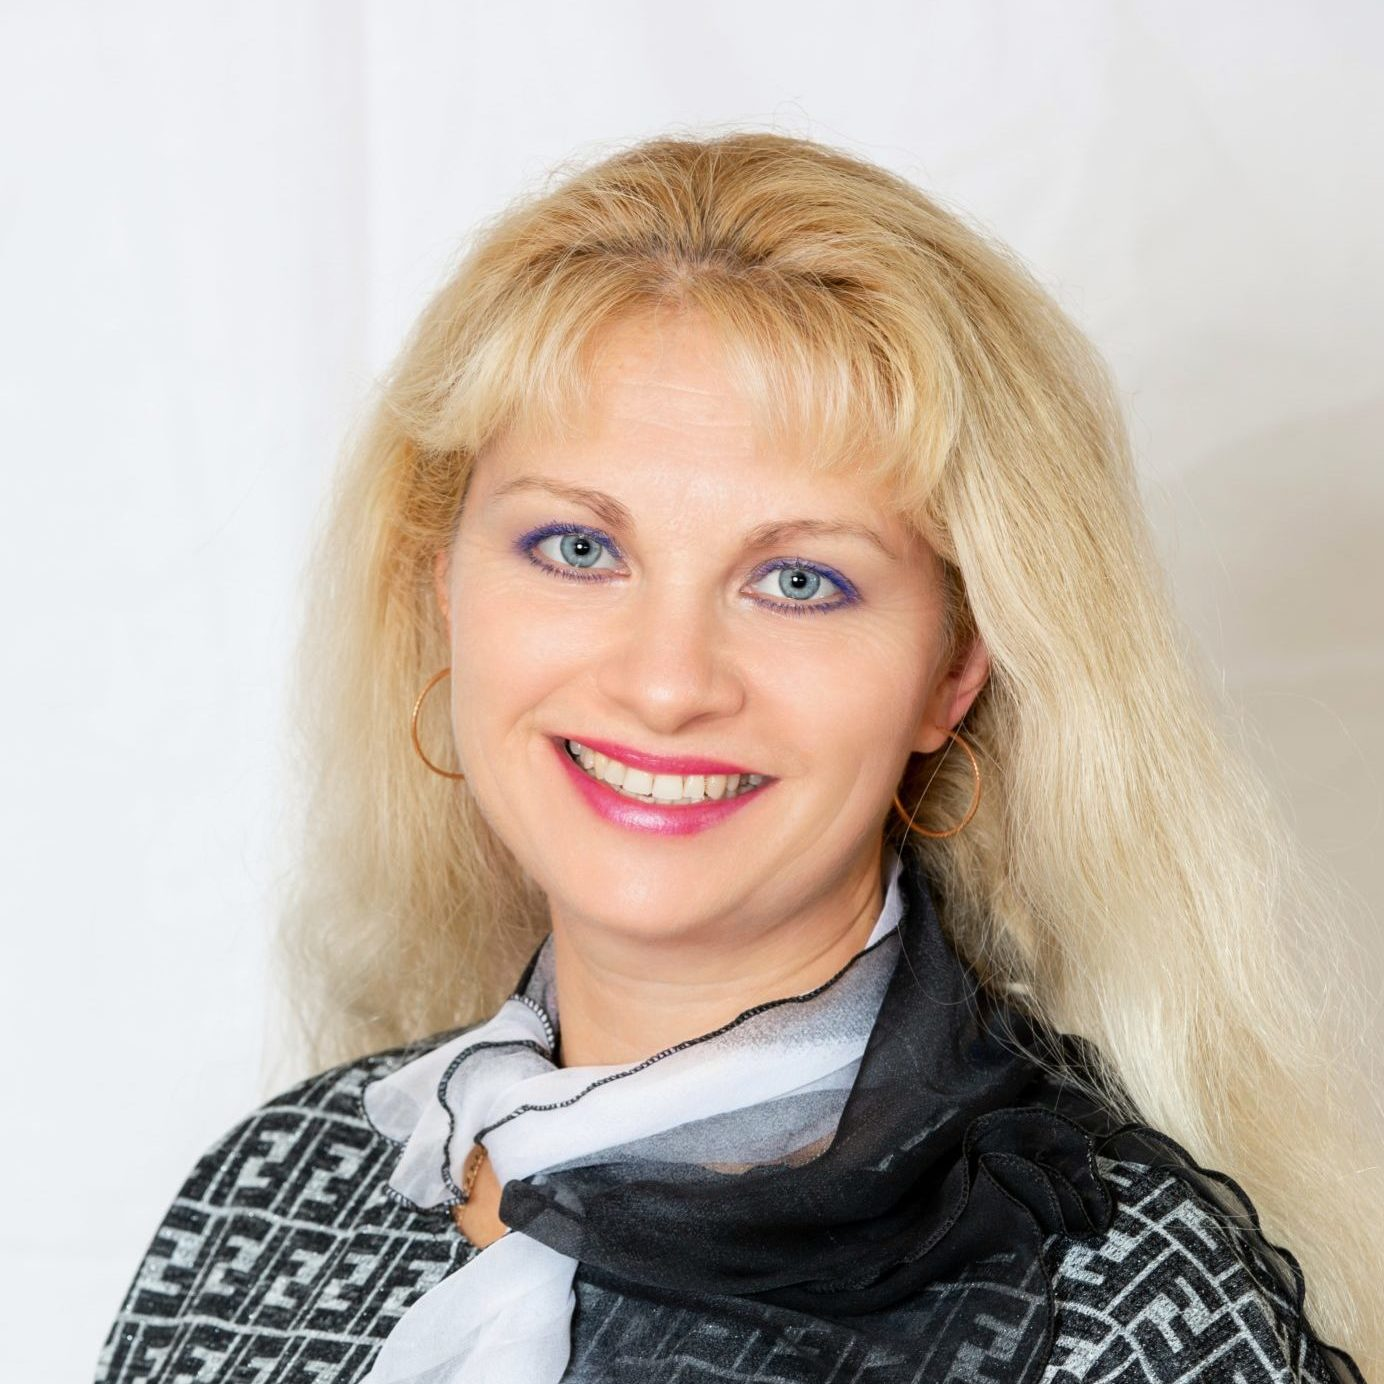 Оксана Владимировна Дерябина